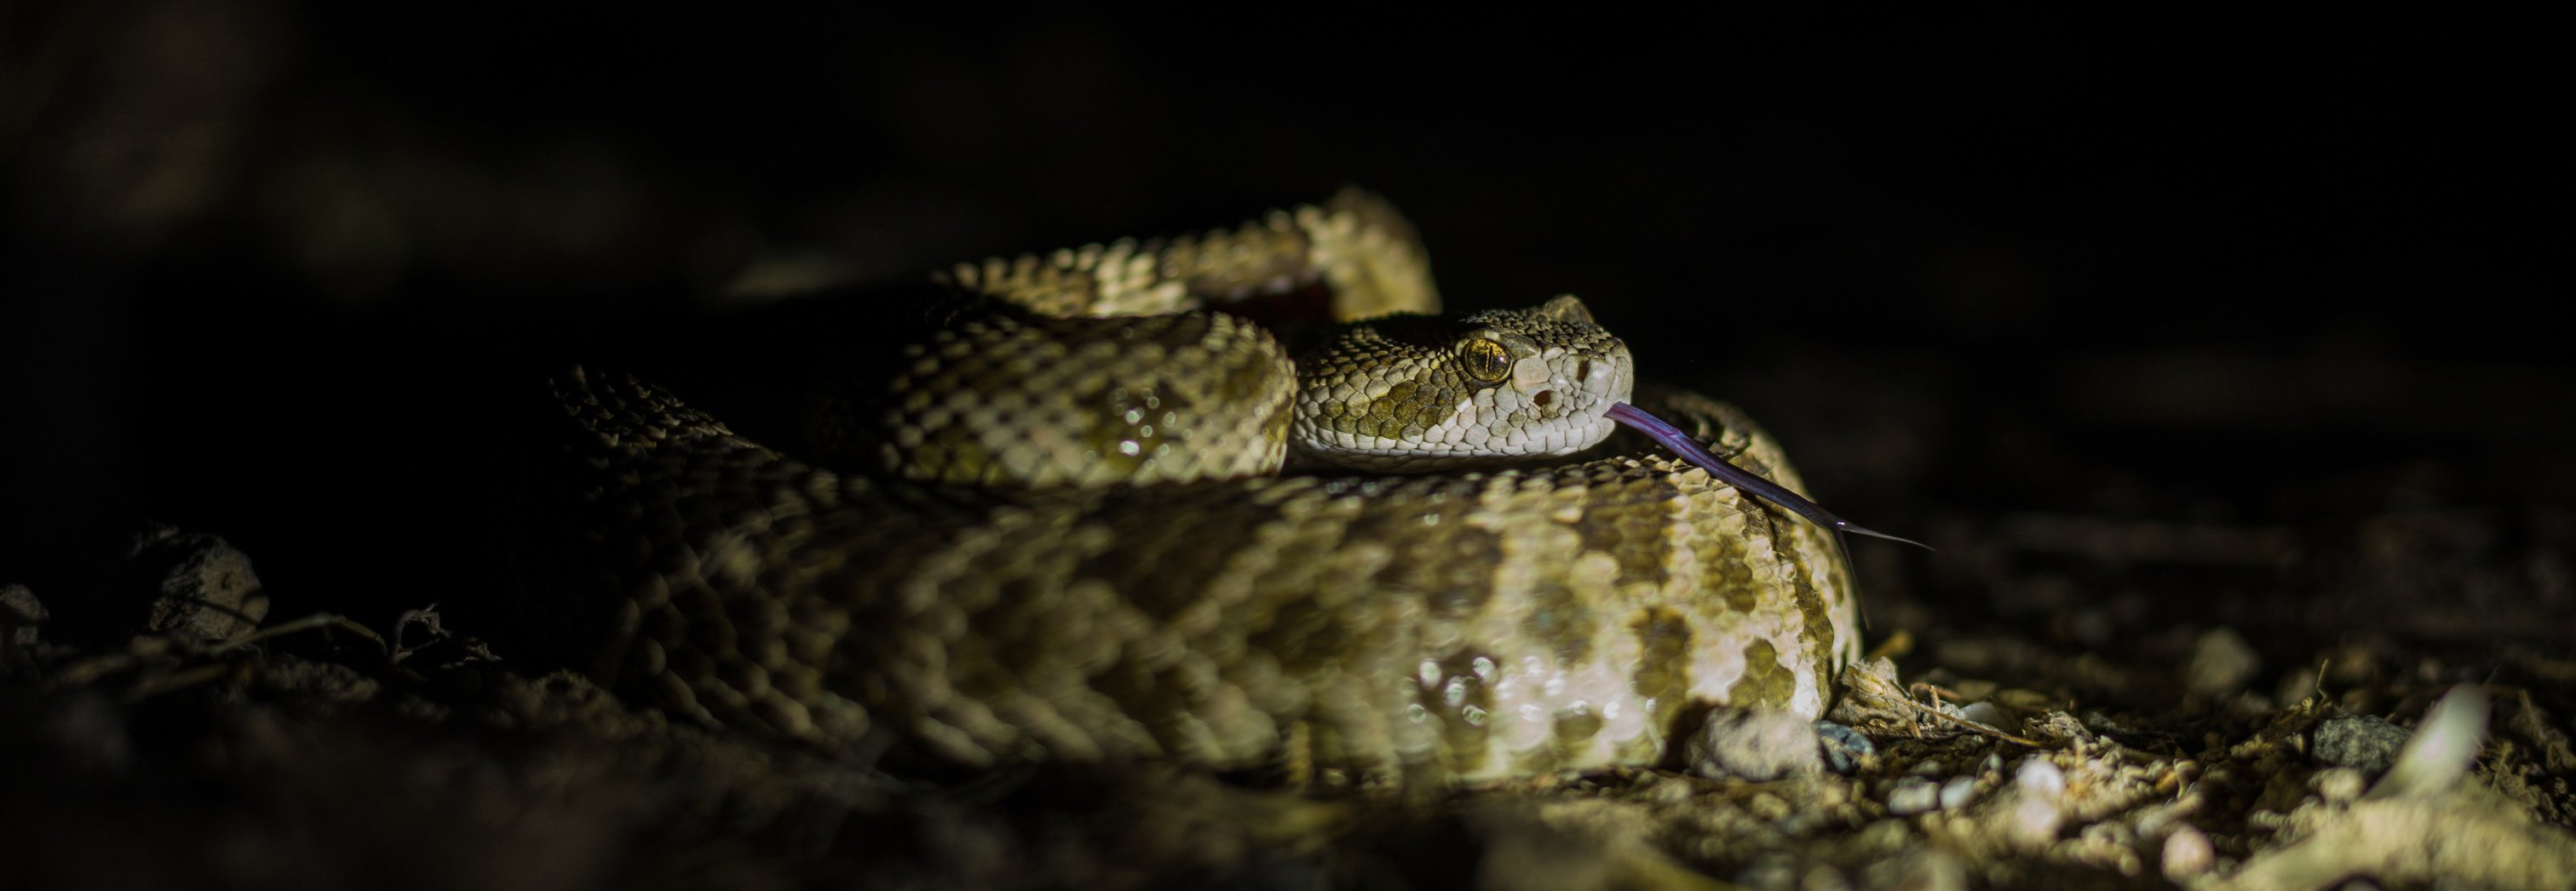 Rattlesnake Removal - Placer Snake Removal